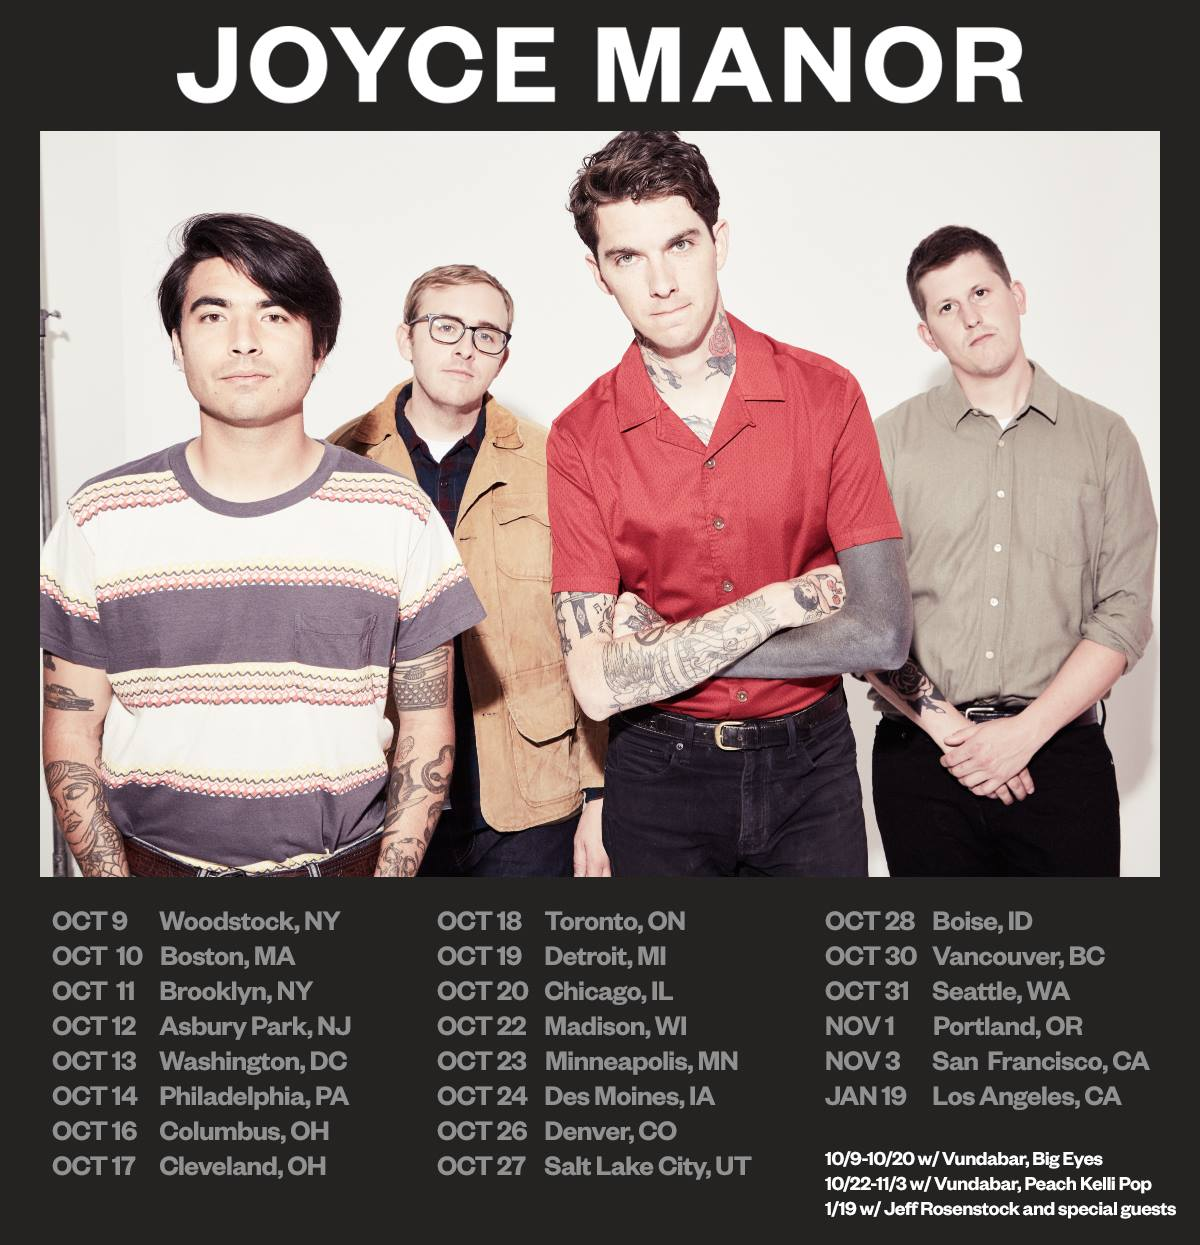 Joyce Manor Fall U.S. Tour 2018